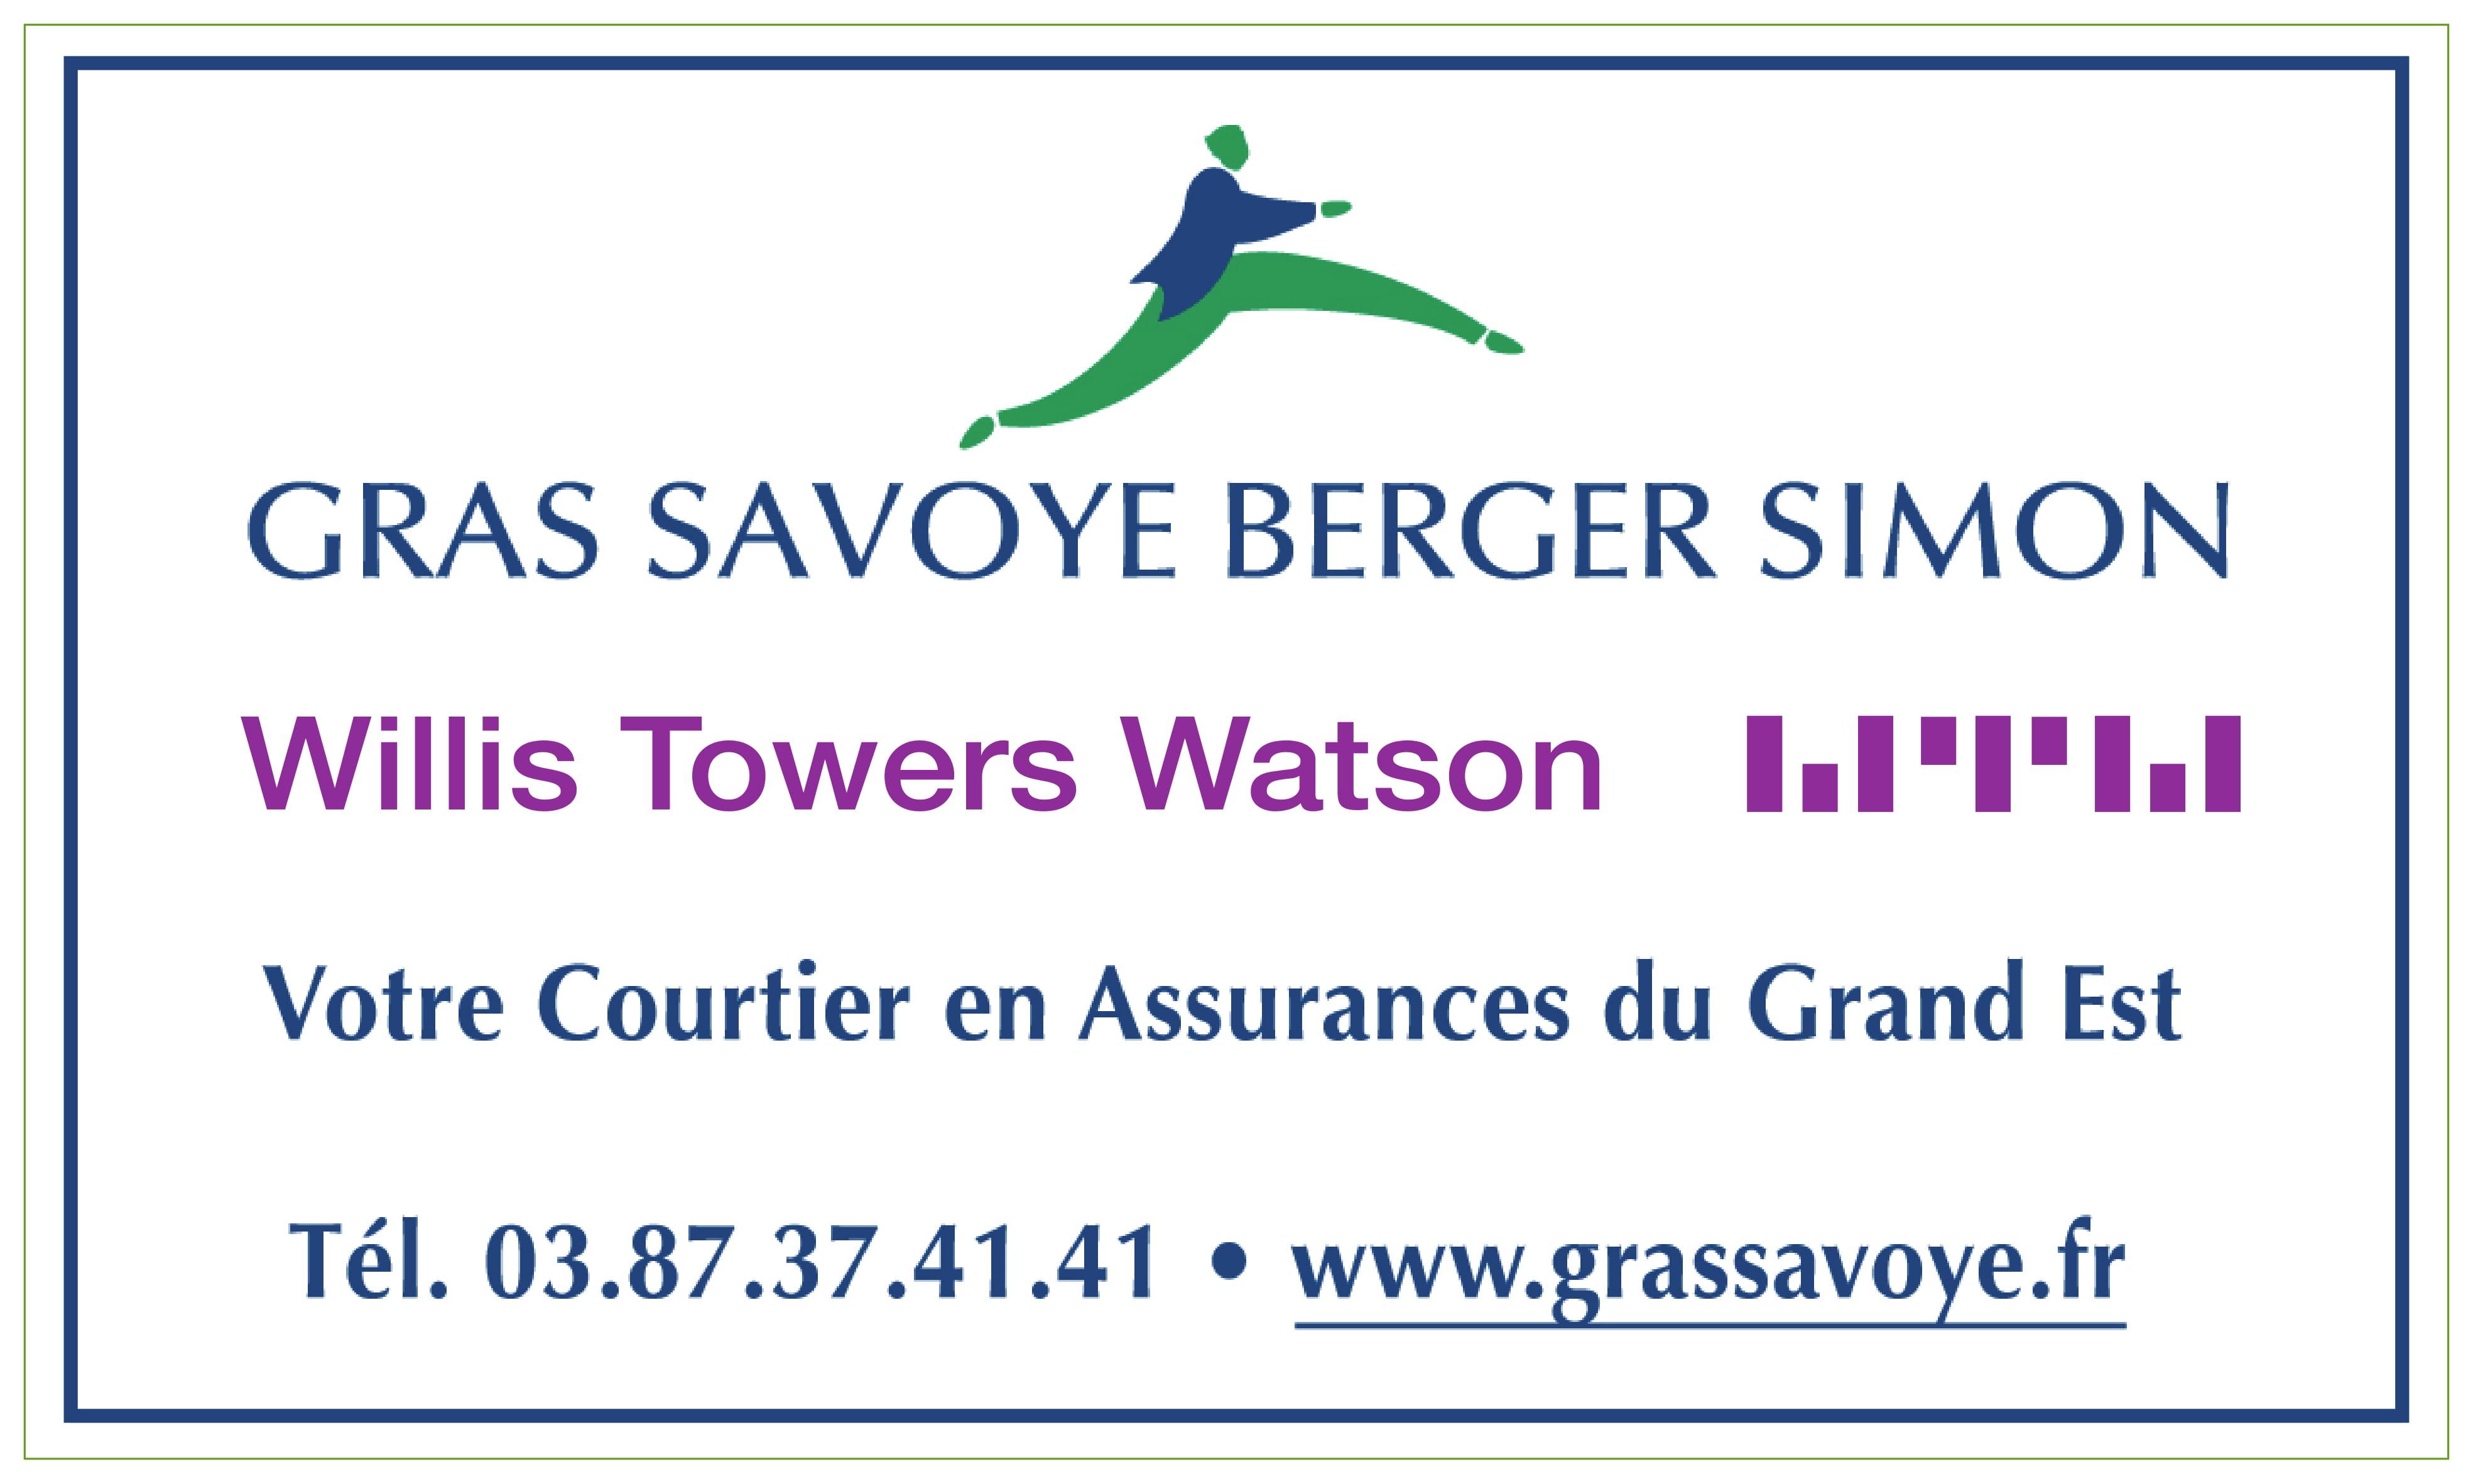 GRAS SAVOYE_GRANGE ORMES_490X290_1EX 11-1